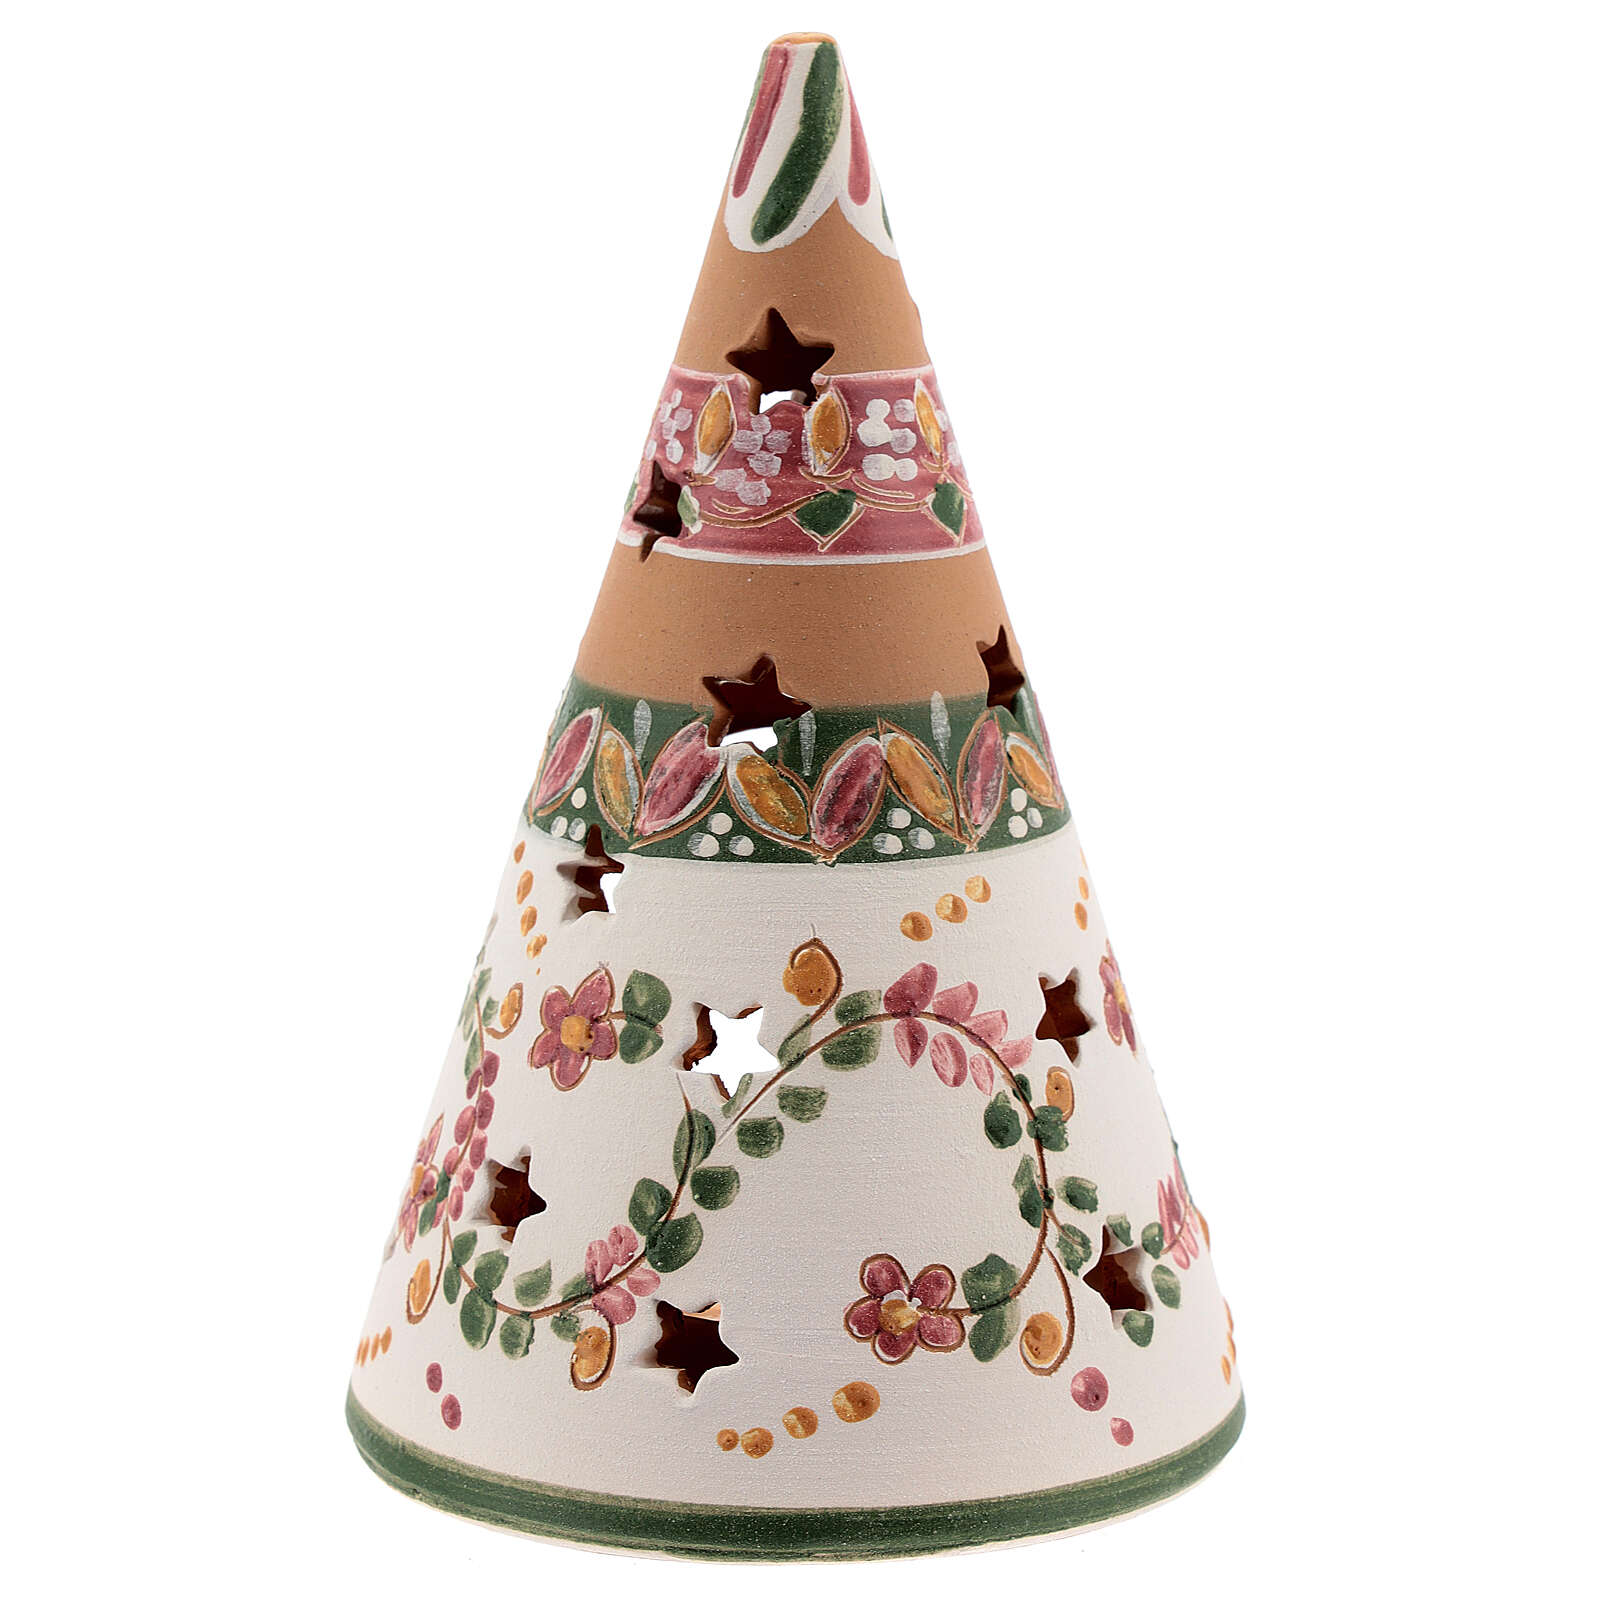 Cono Sagrada Familia terracota natural vela Deruta 15 cm motivos rosas 4